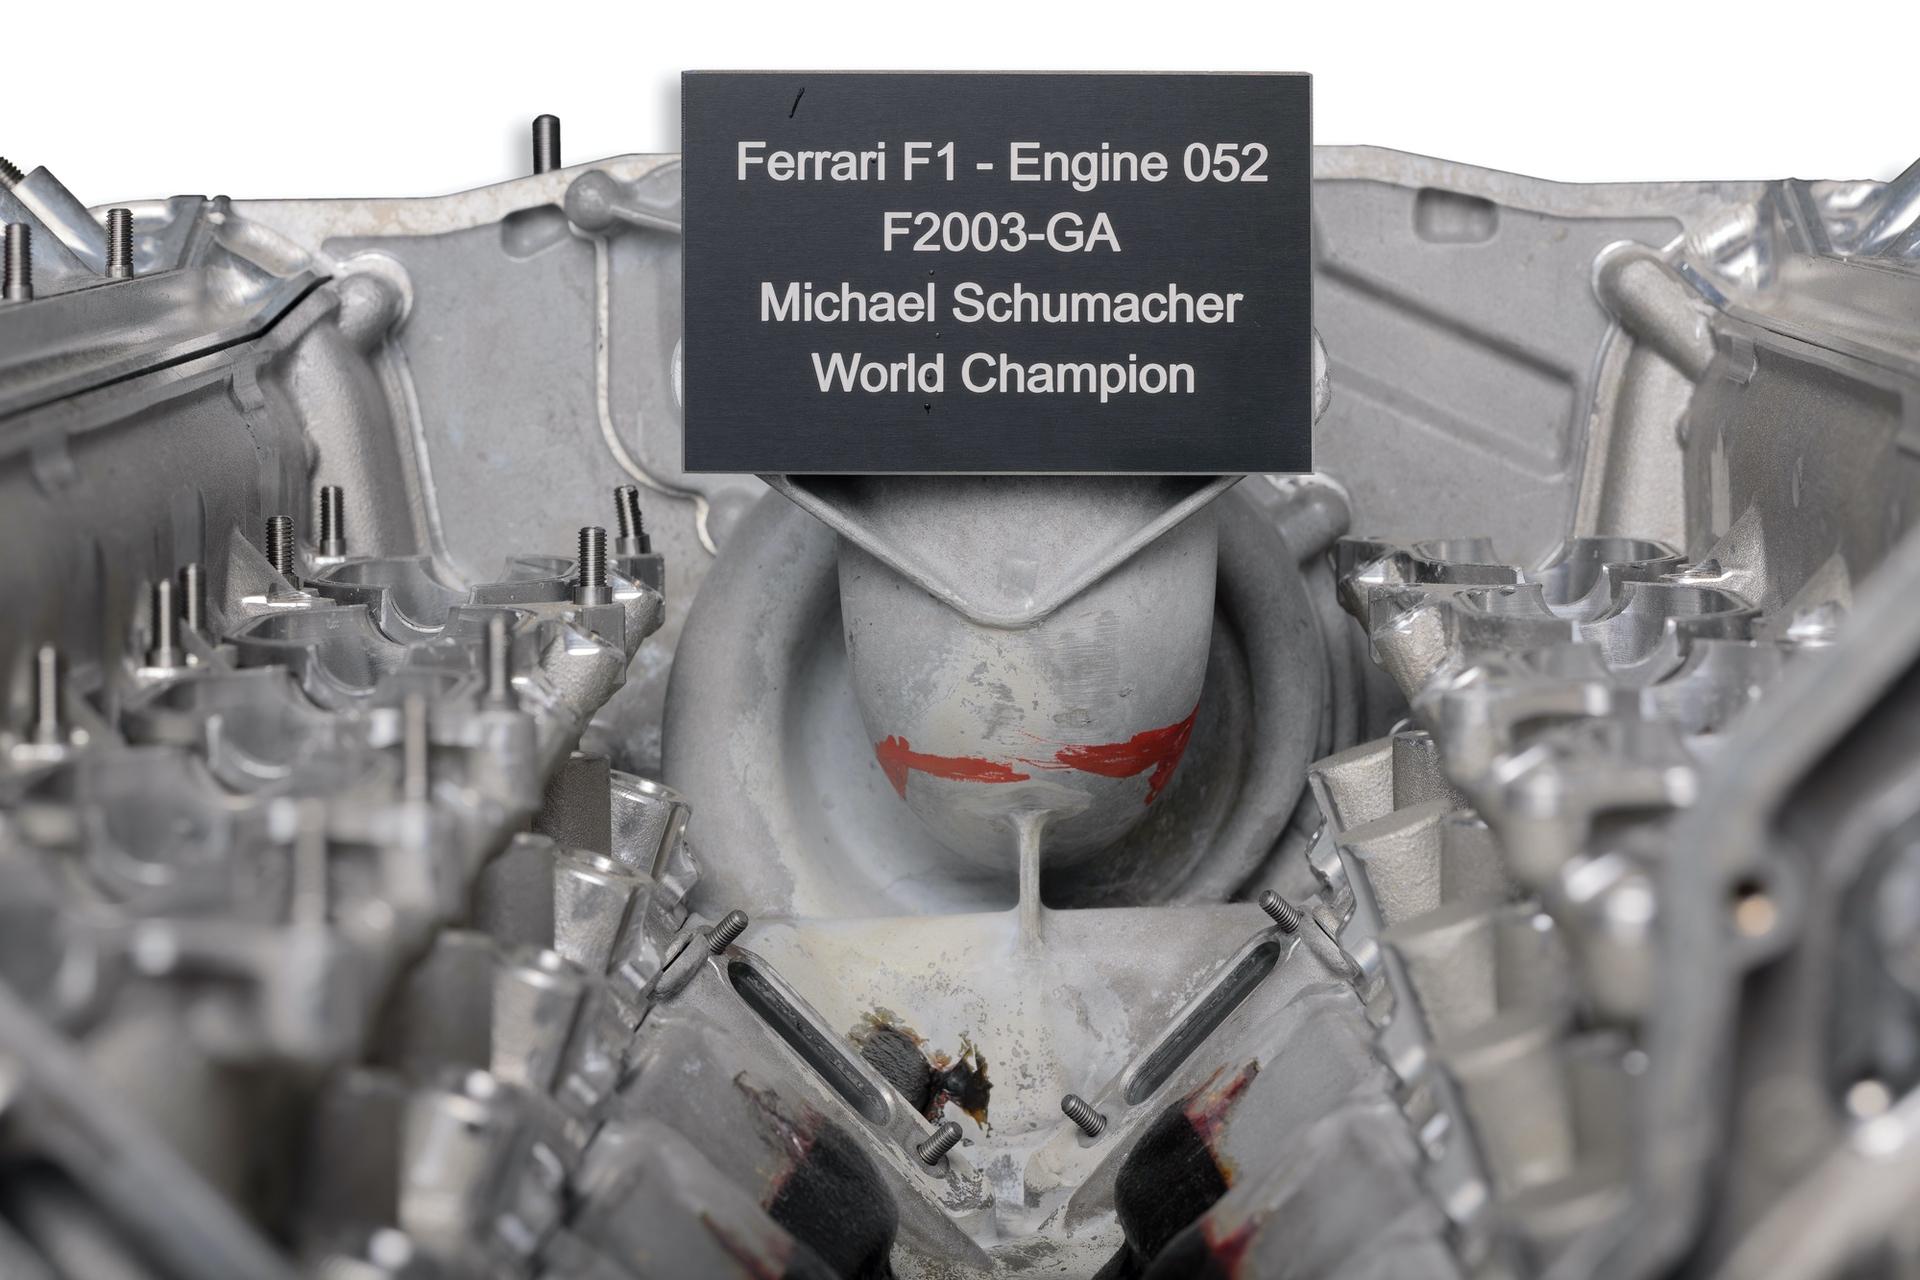 Ferrari_F2003-GA_Engine_0006